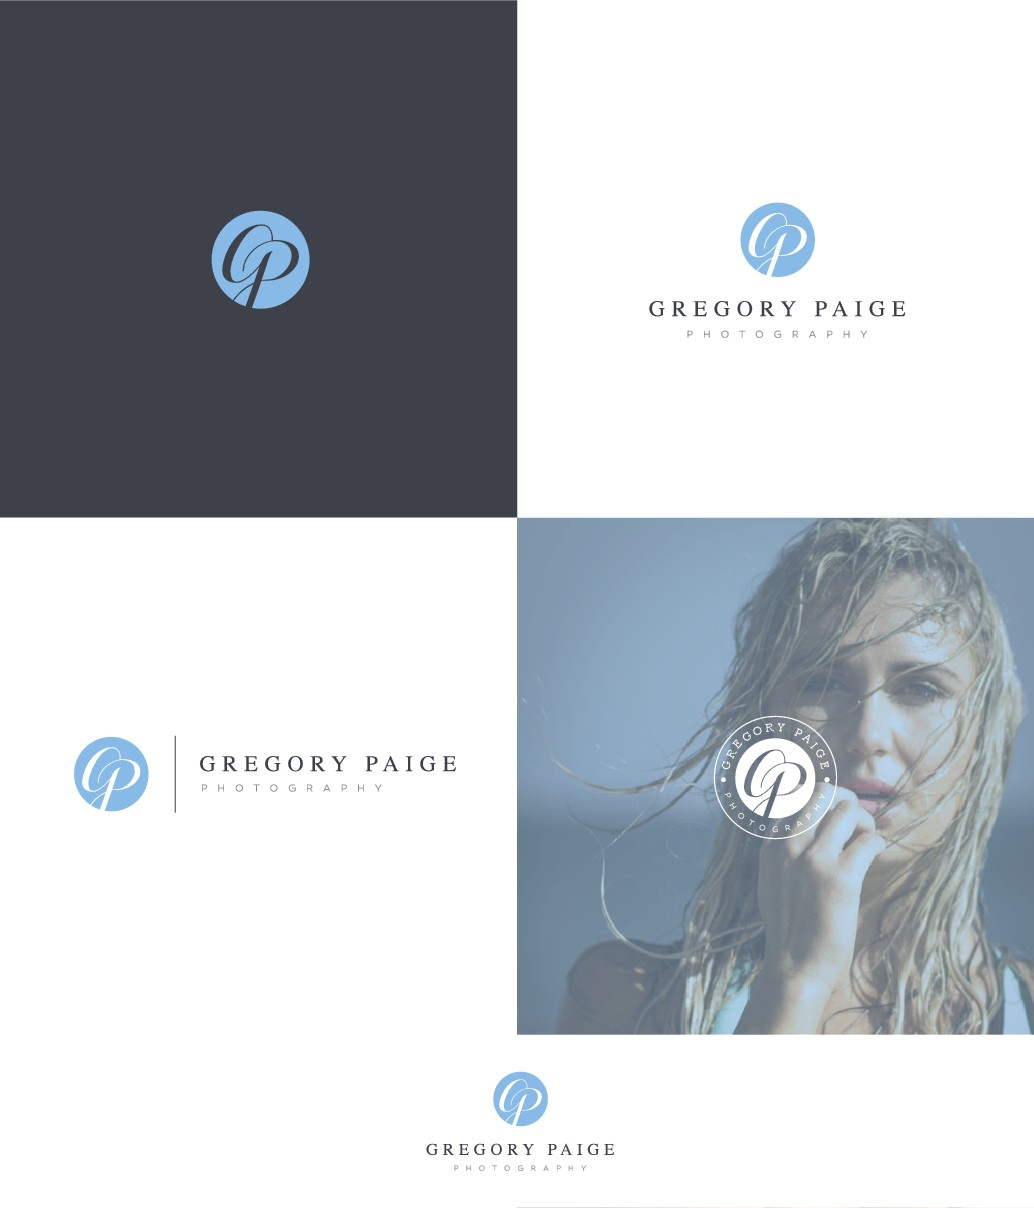 Design a clean, sophisticated logo for a portrait/fashion photographer.